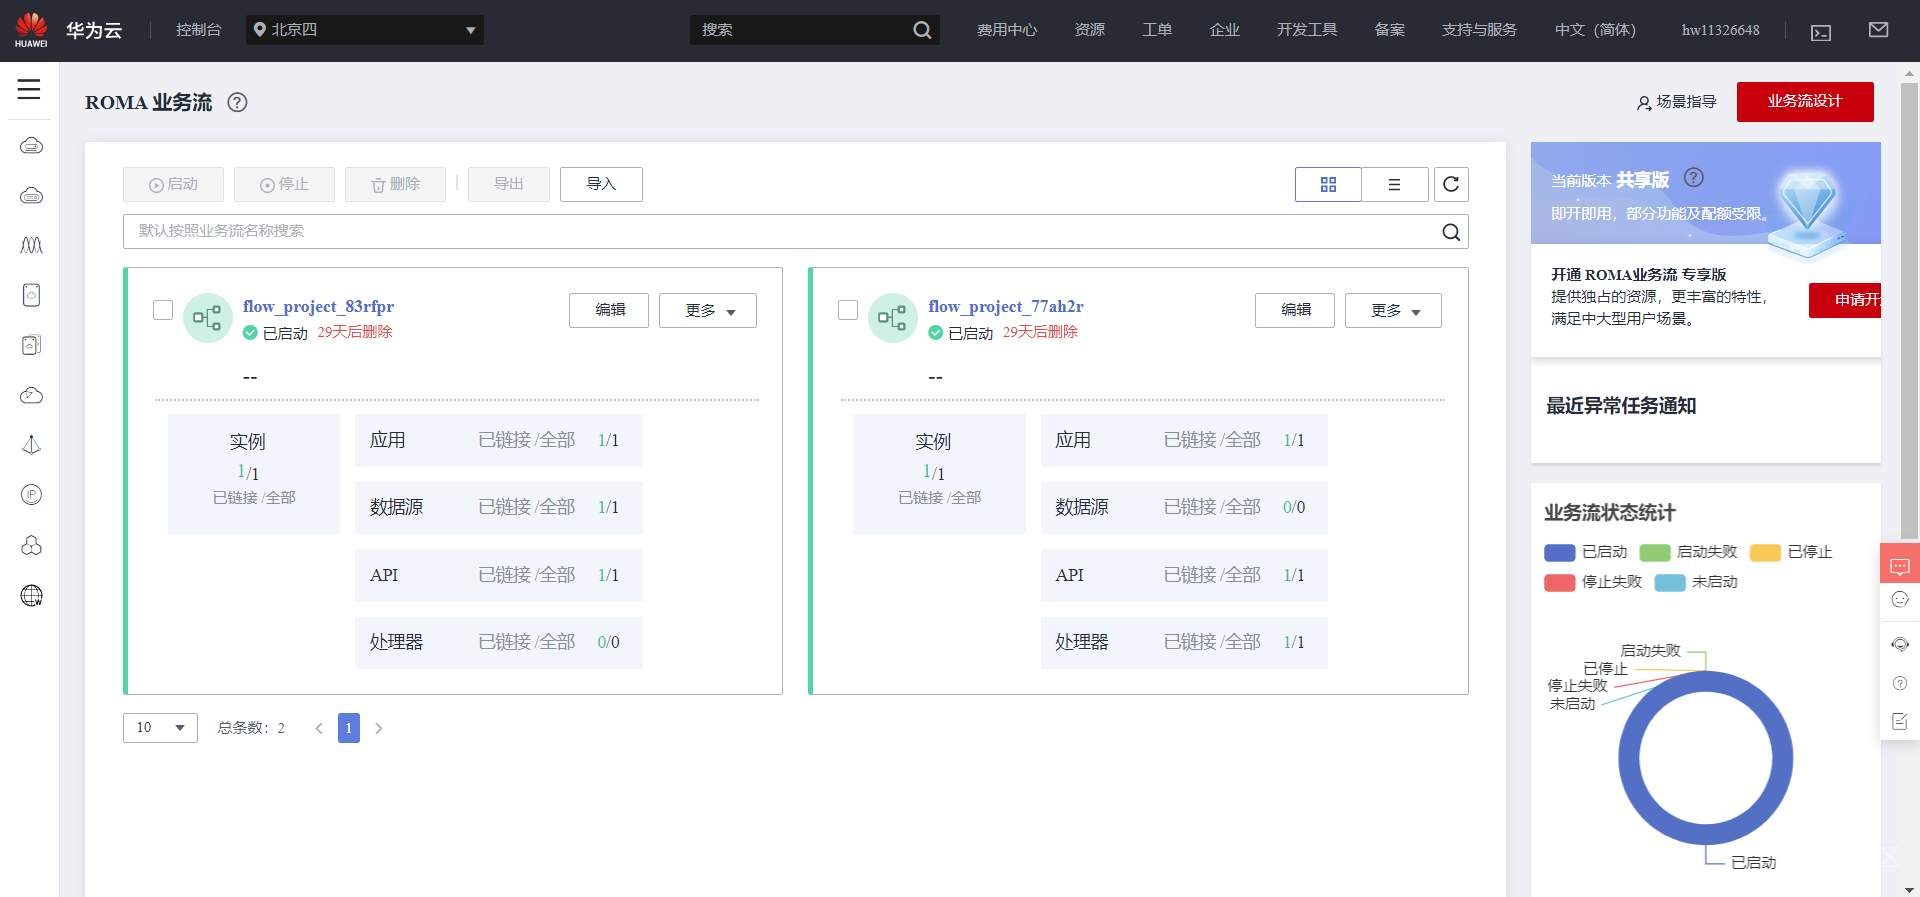 Screenshot 2021-04-02 101022.png